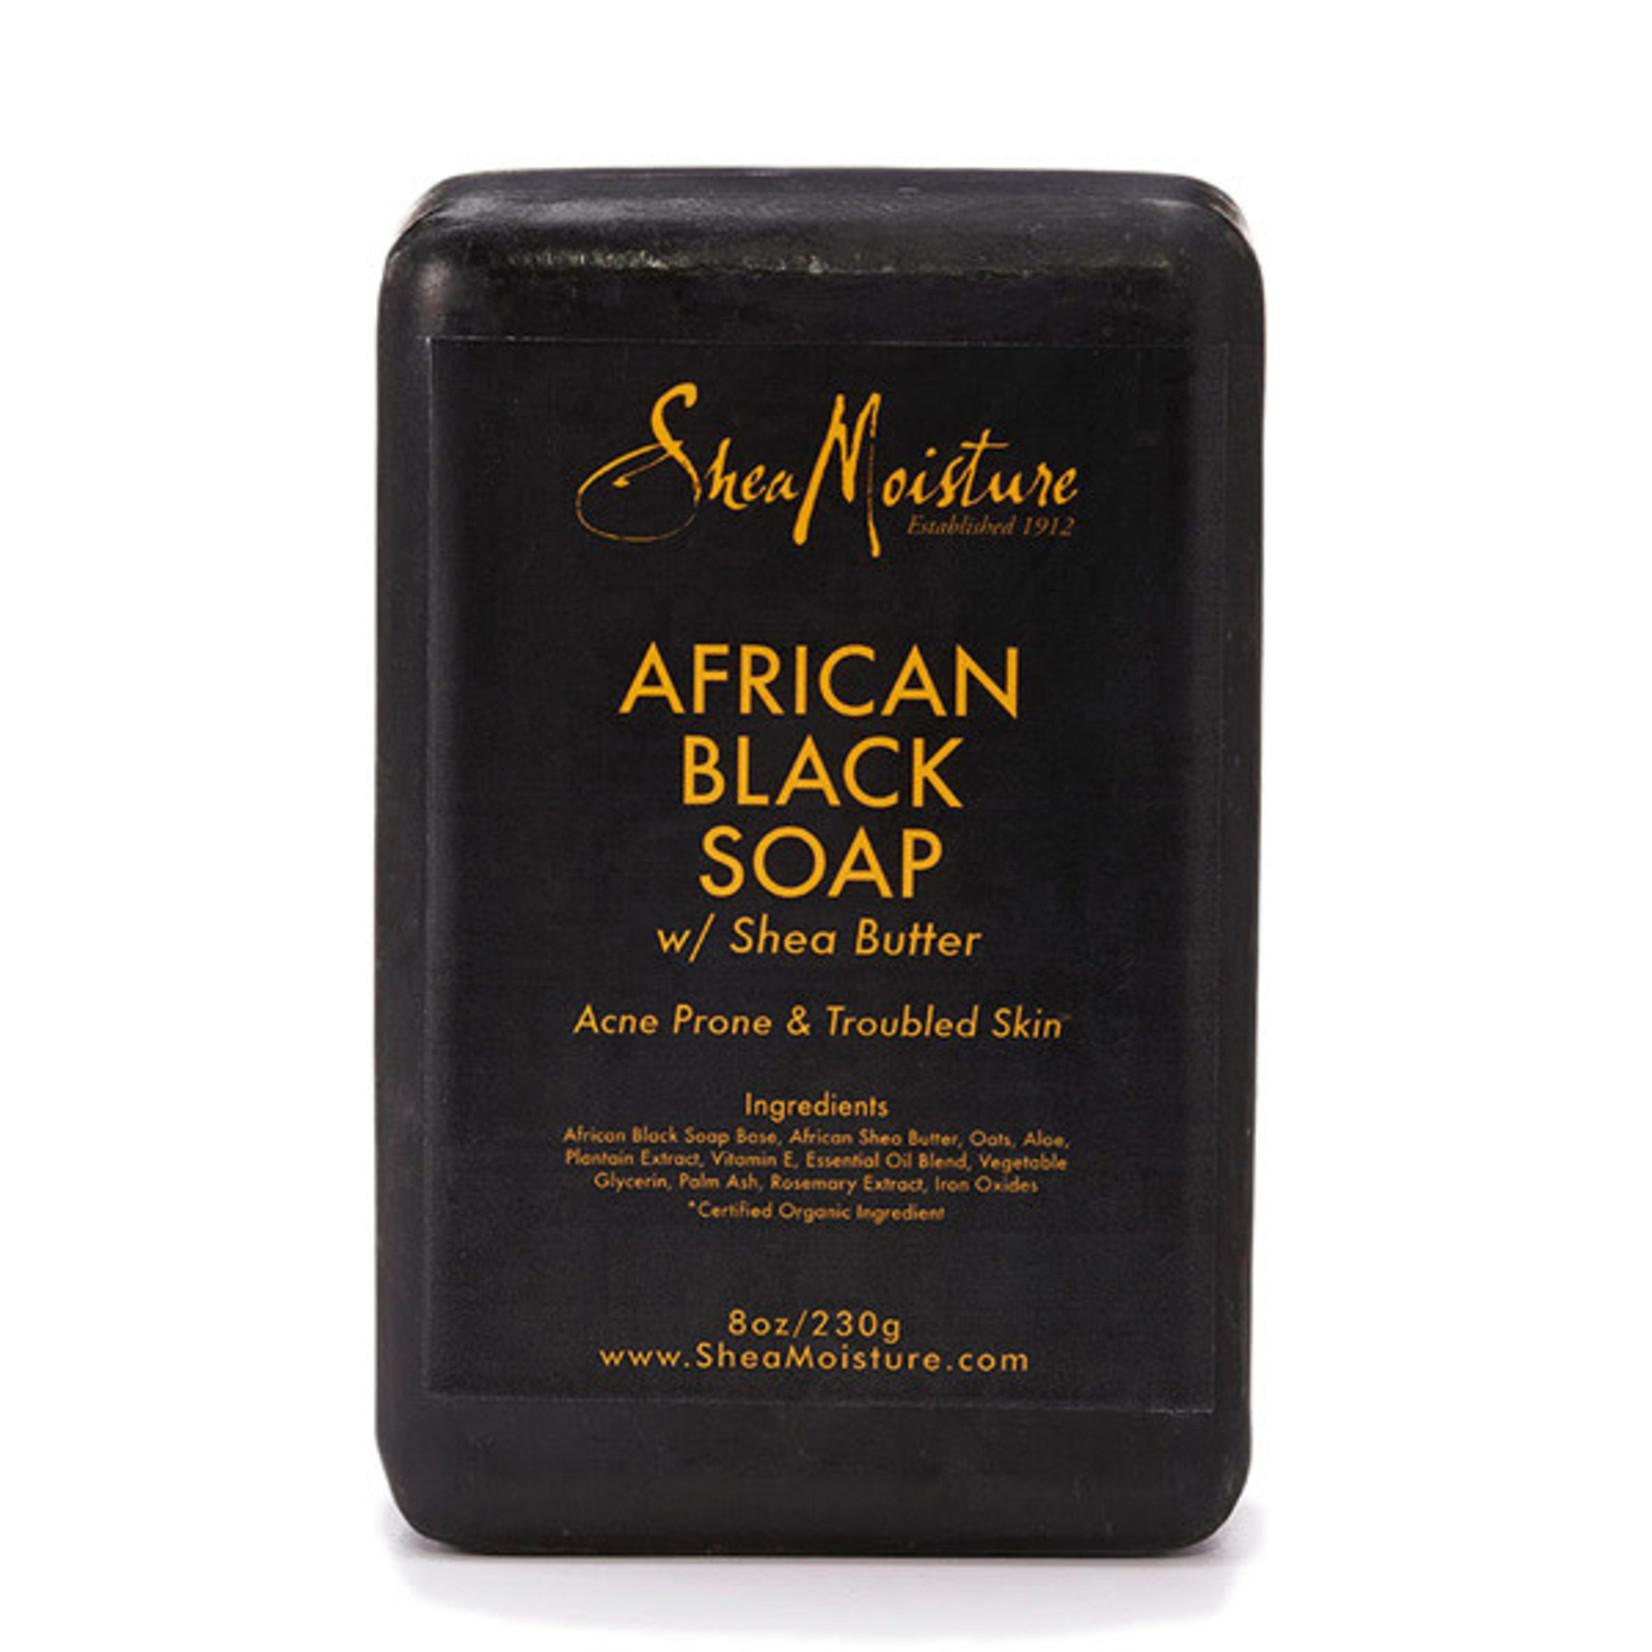 SHEA MOISTURE SHEA MOISTURE AFRICAN BLACK SOAP [8OZ]